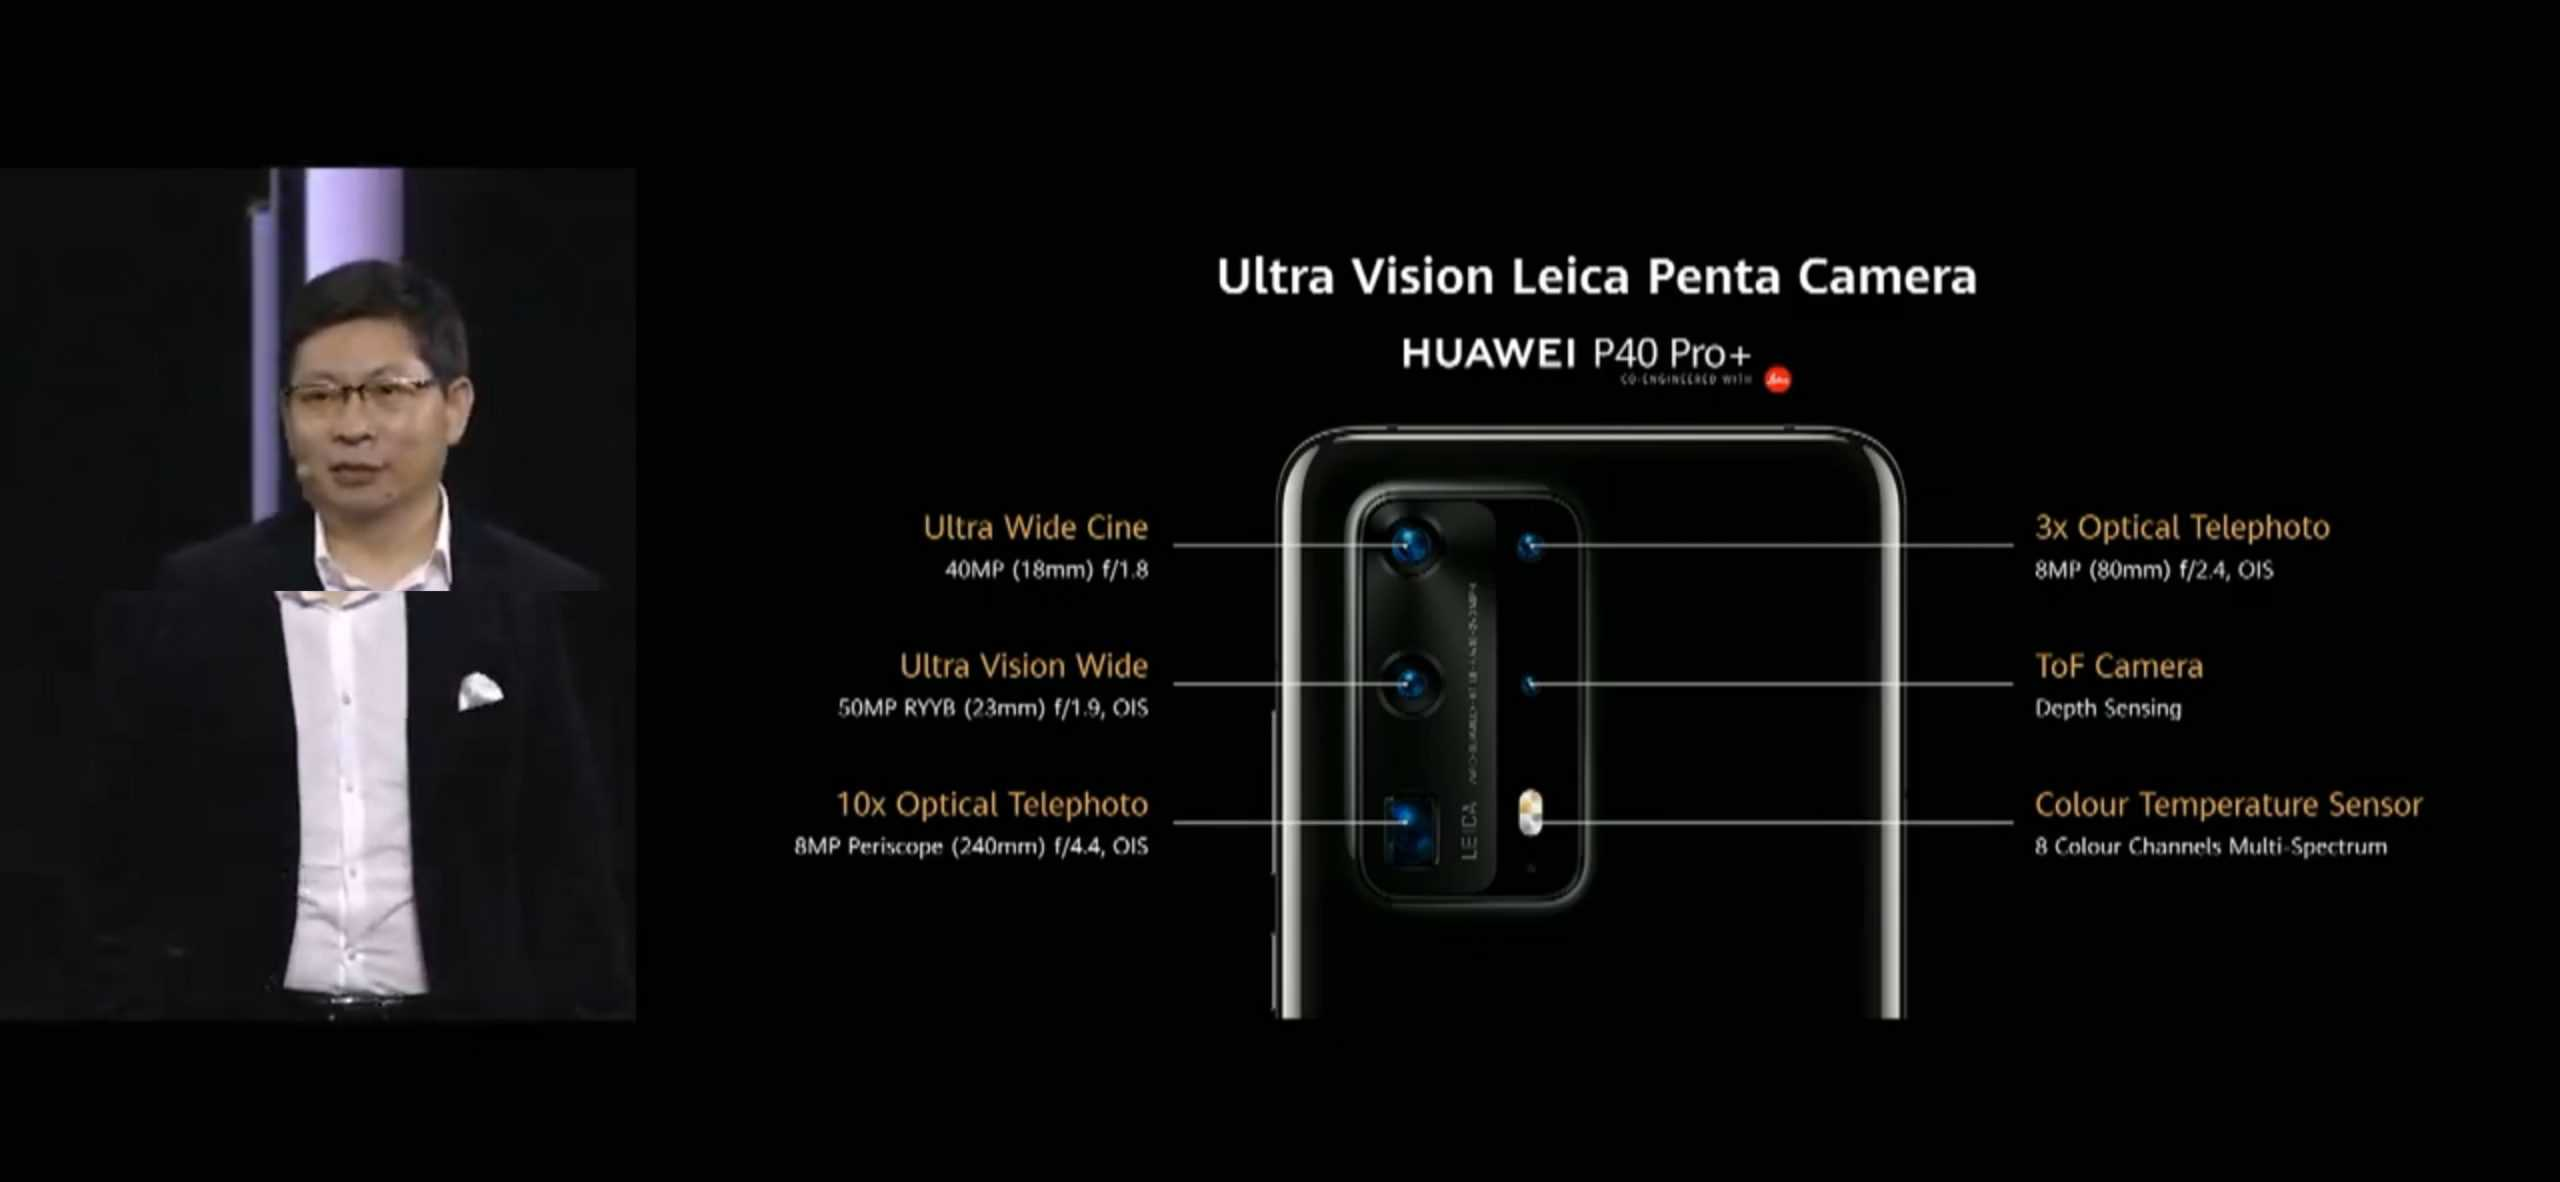 Huawei P40 Pro Plus camera specs